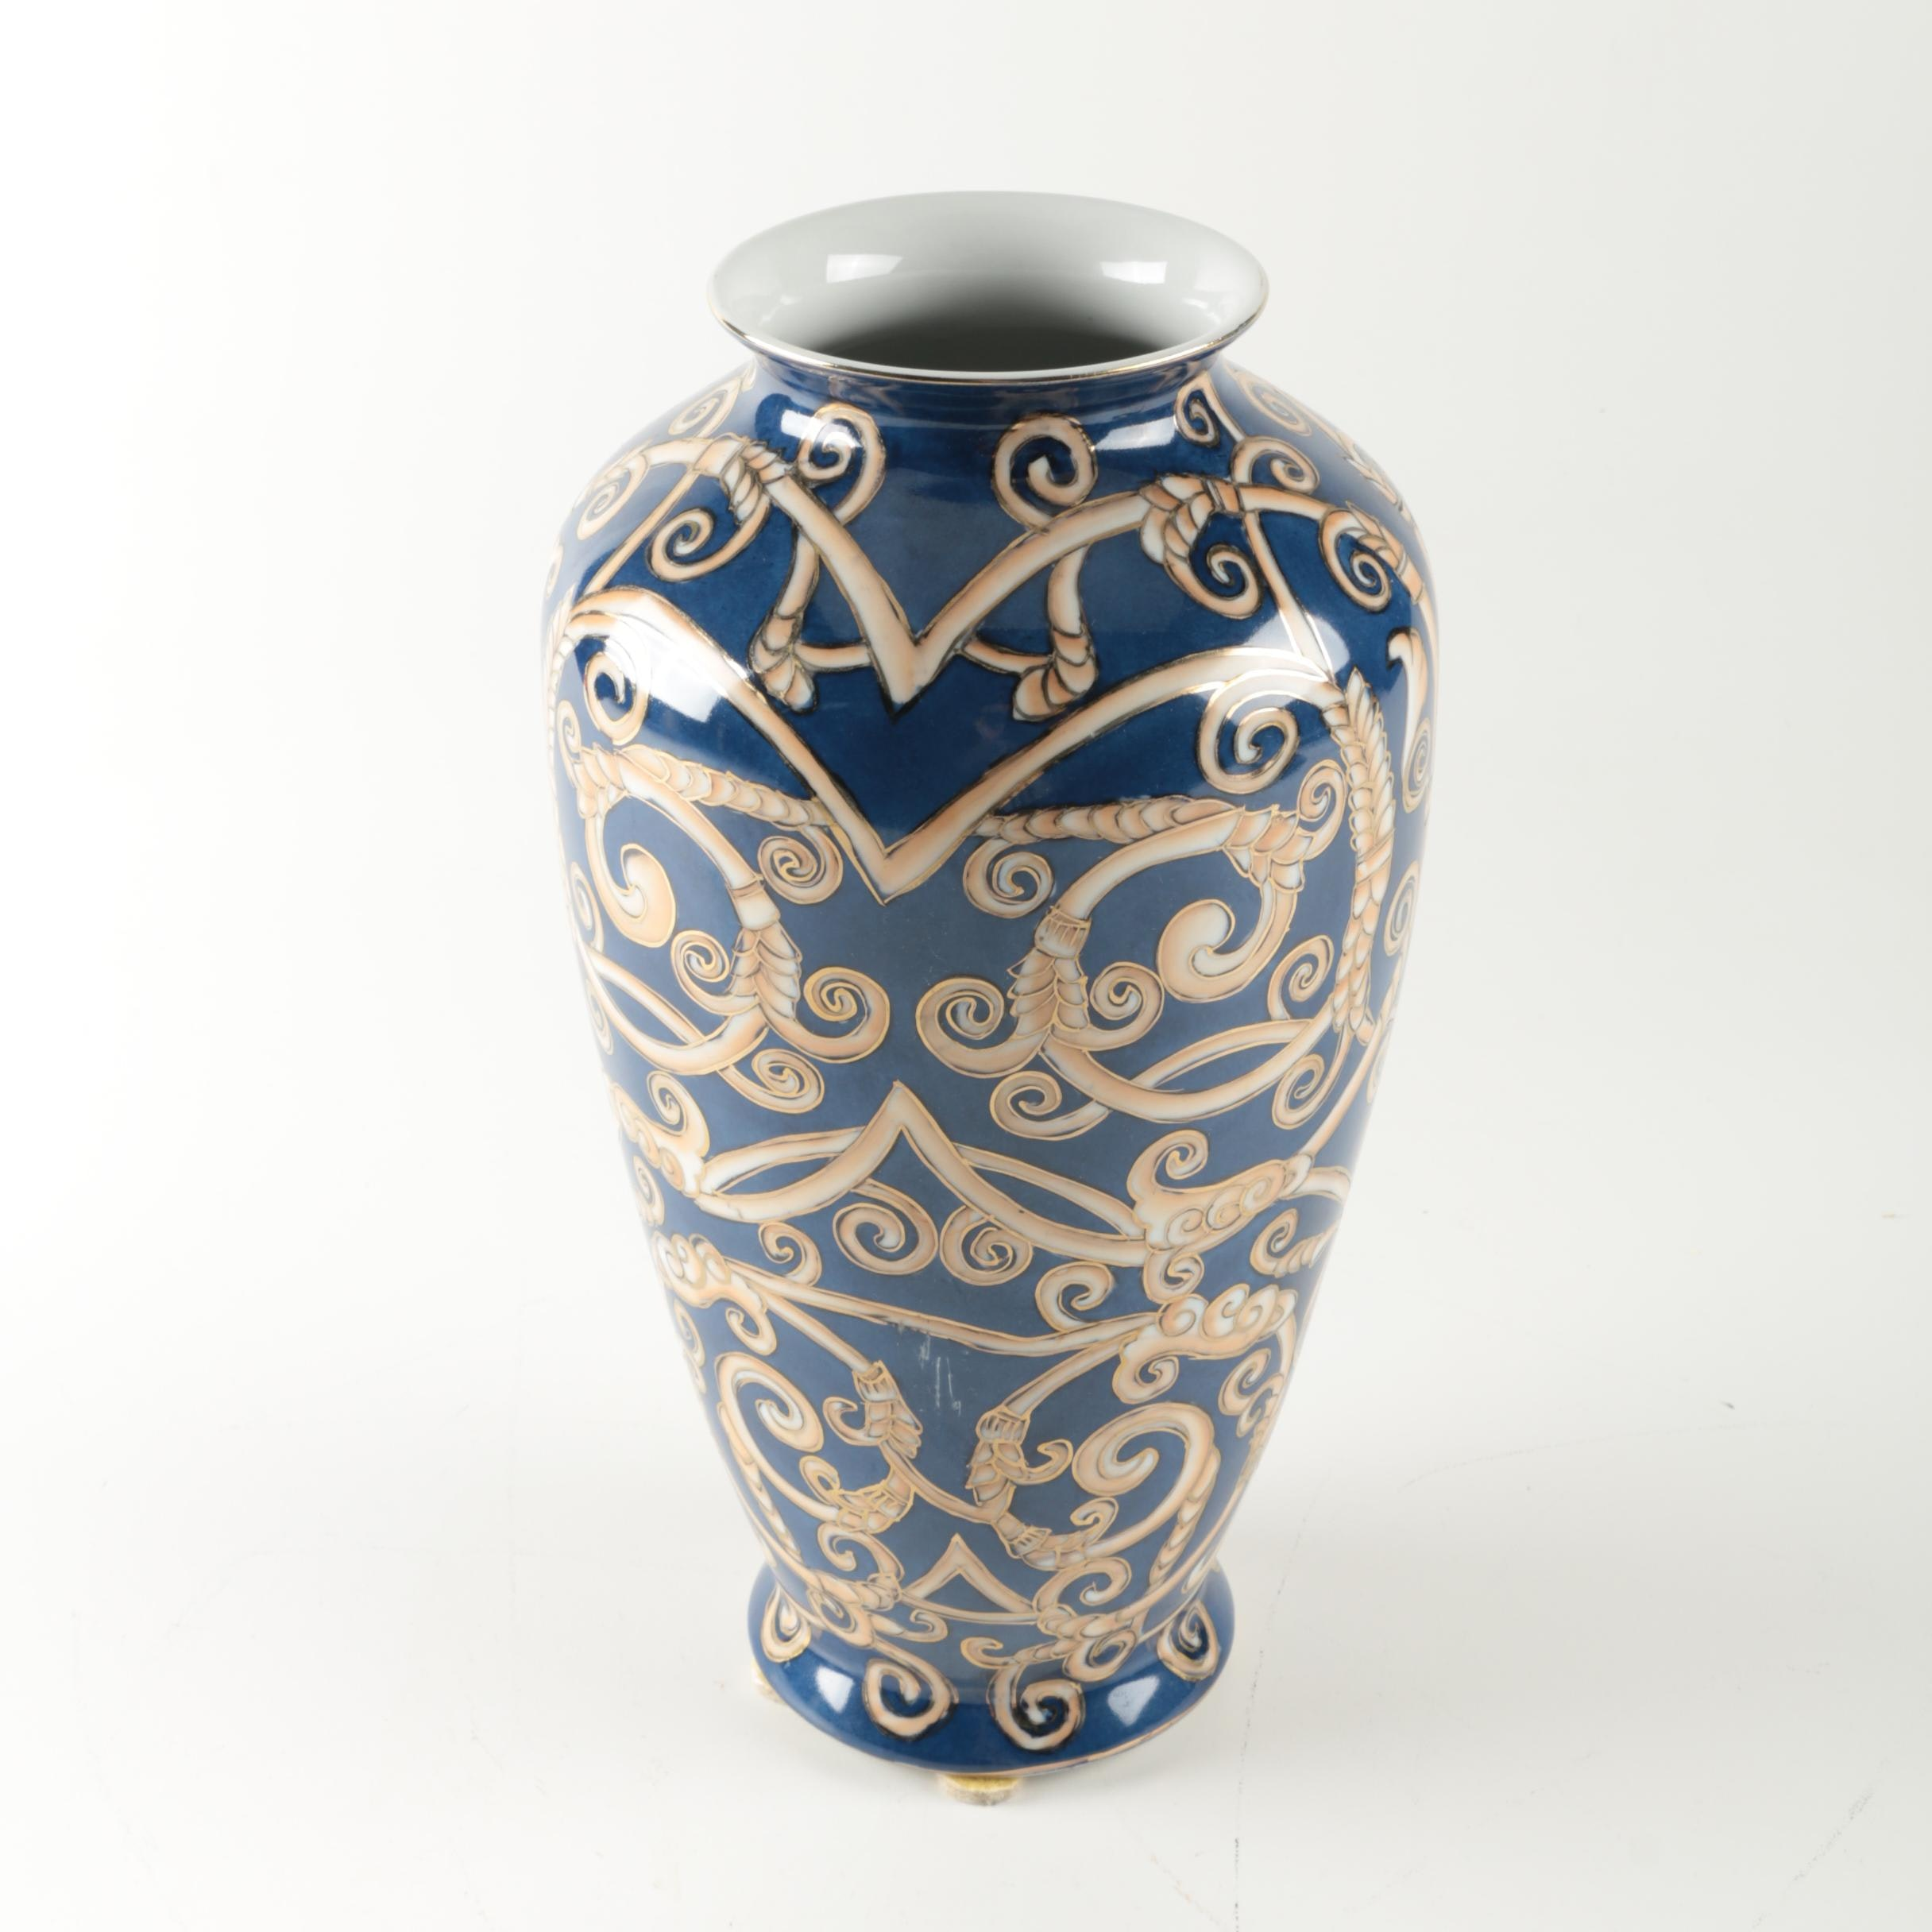 Temptation Porcelain Vase